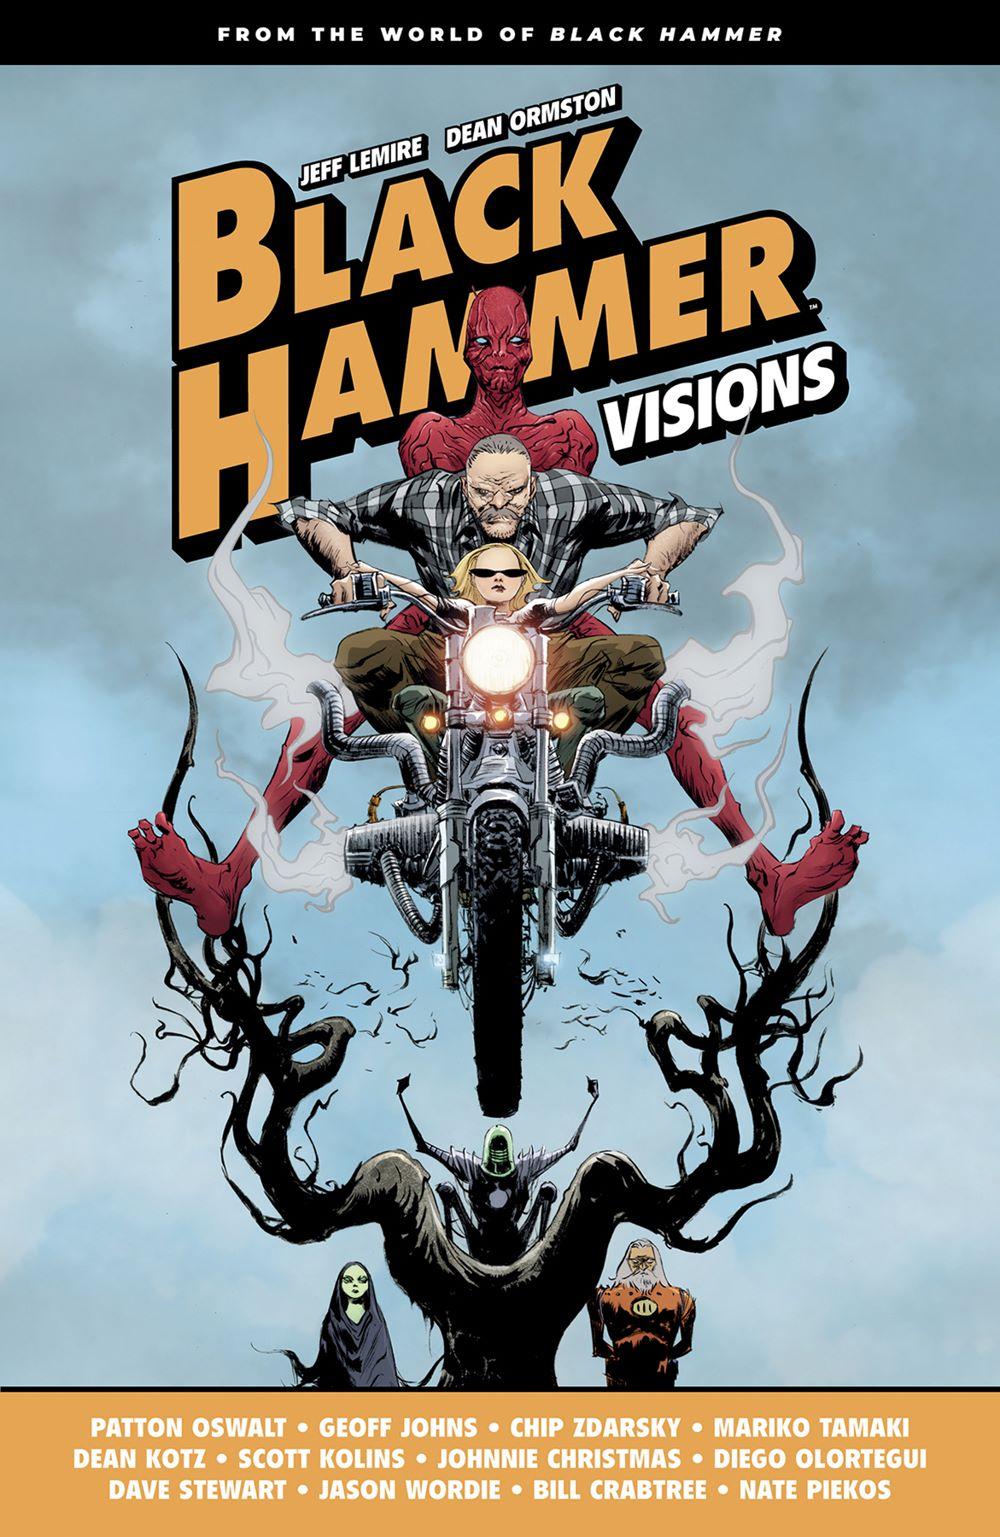 BKHMRVIS_HC_CVR_4X6_SOL Dark Horse Comics July 2021 Solicitations